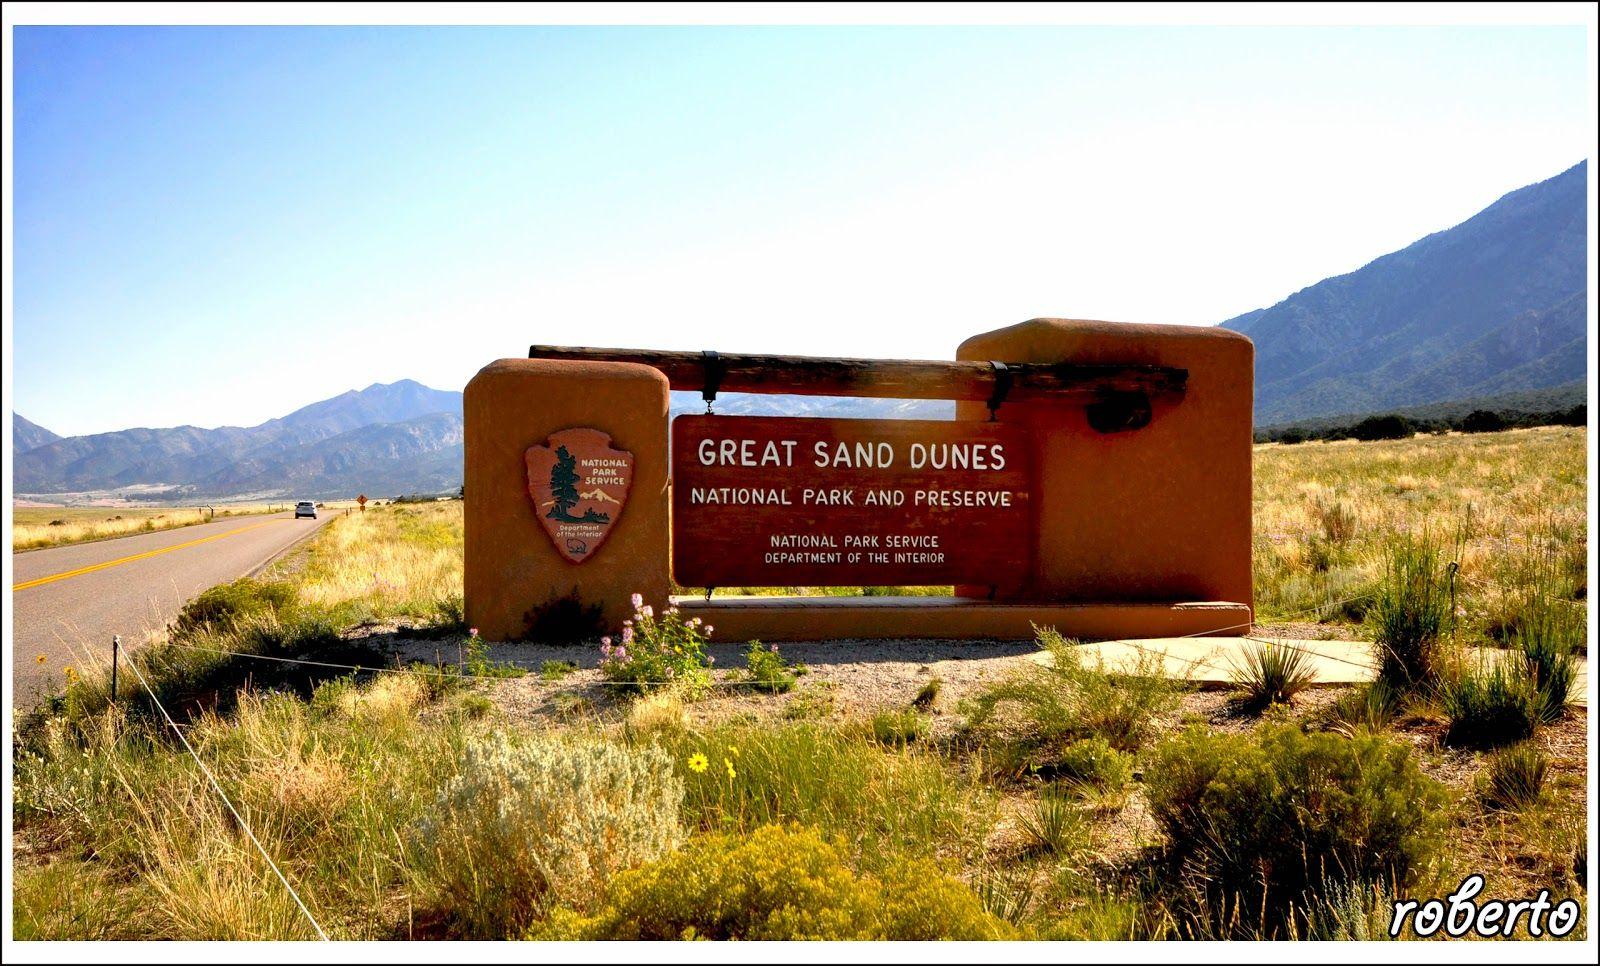 emozioni & viaggi: Great Sand Dunes - Colorado -  U.S. National Parks and Monuments